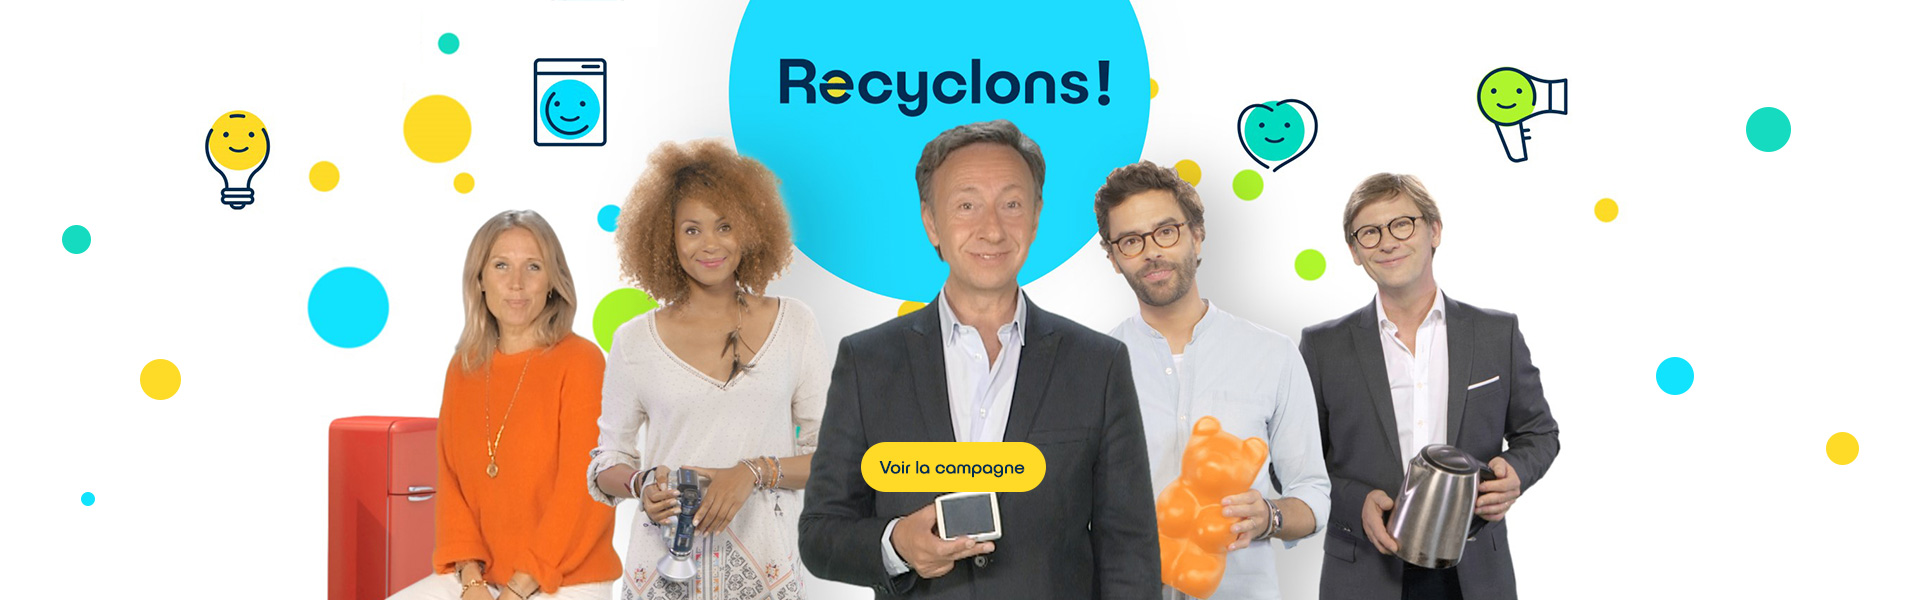 Recyclons !